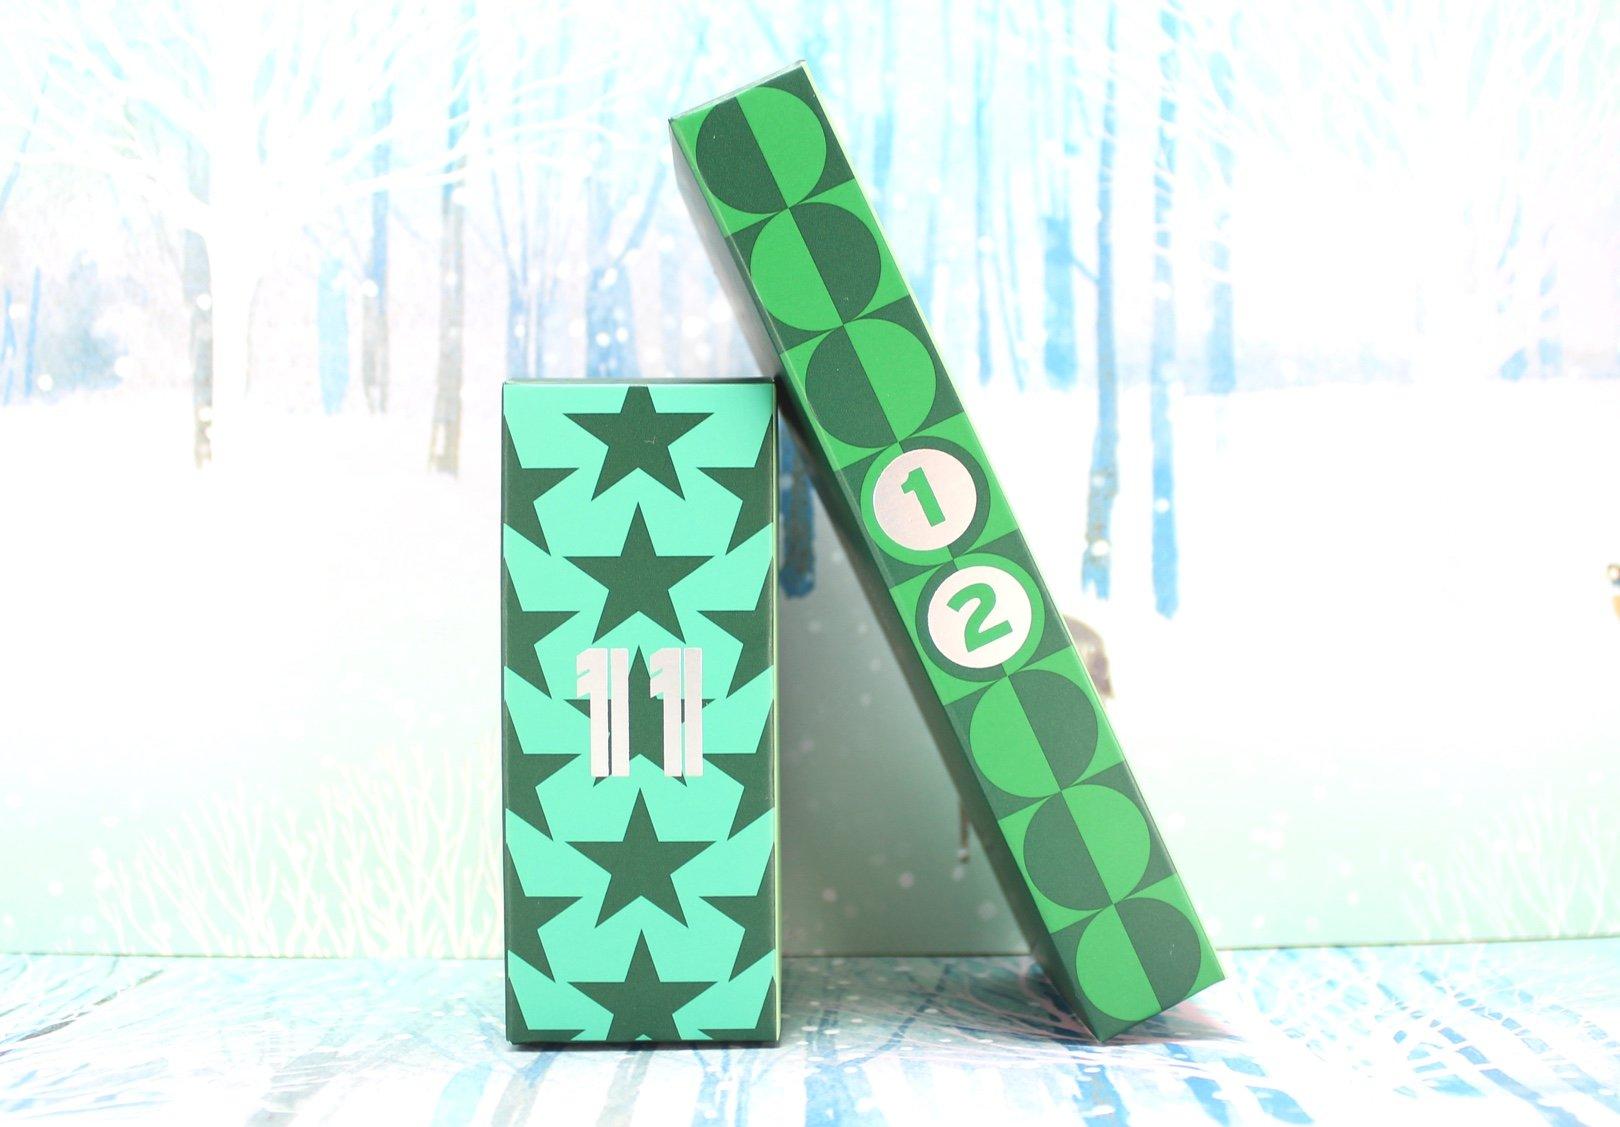 The Body Shop Deluxe Advent Calendar: Days 11-12